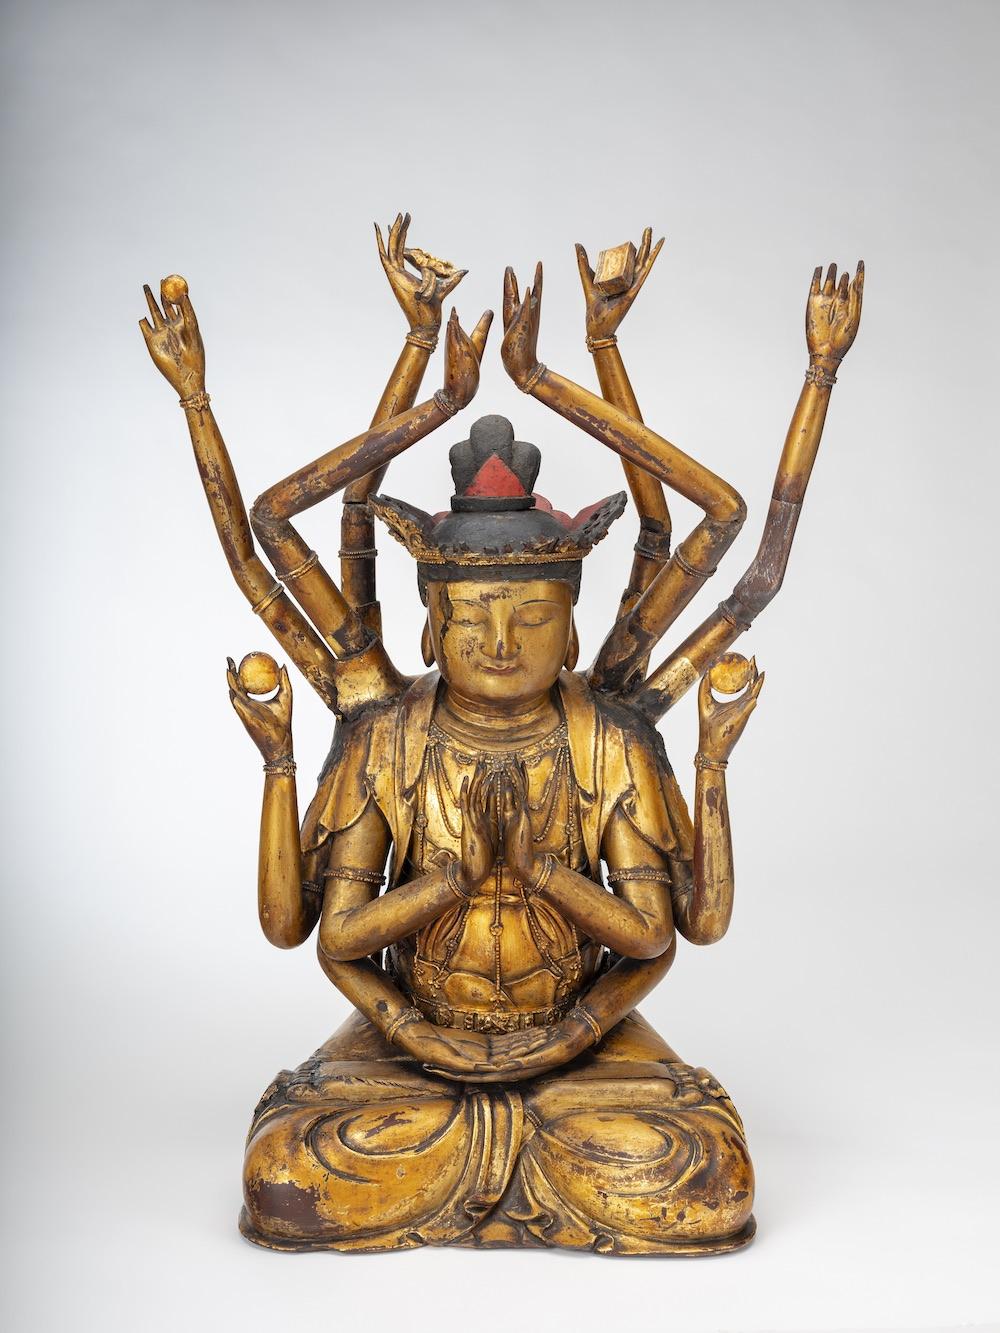 Avalokitesvara: Museum of Archaeology and Anthropology, Cambridge